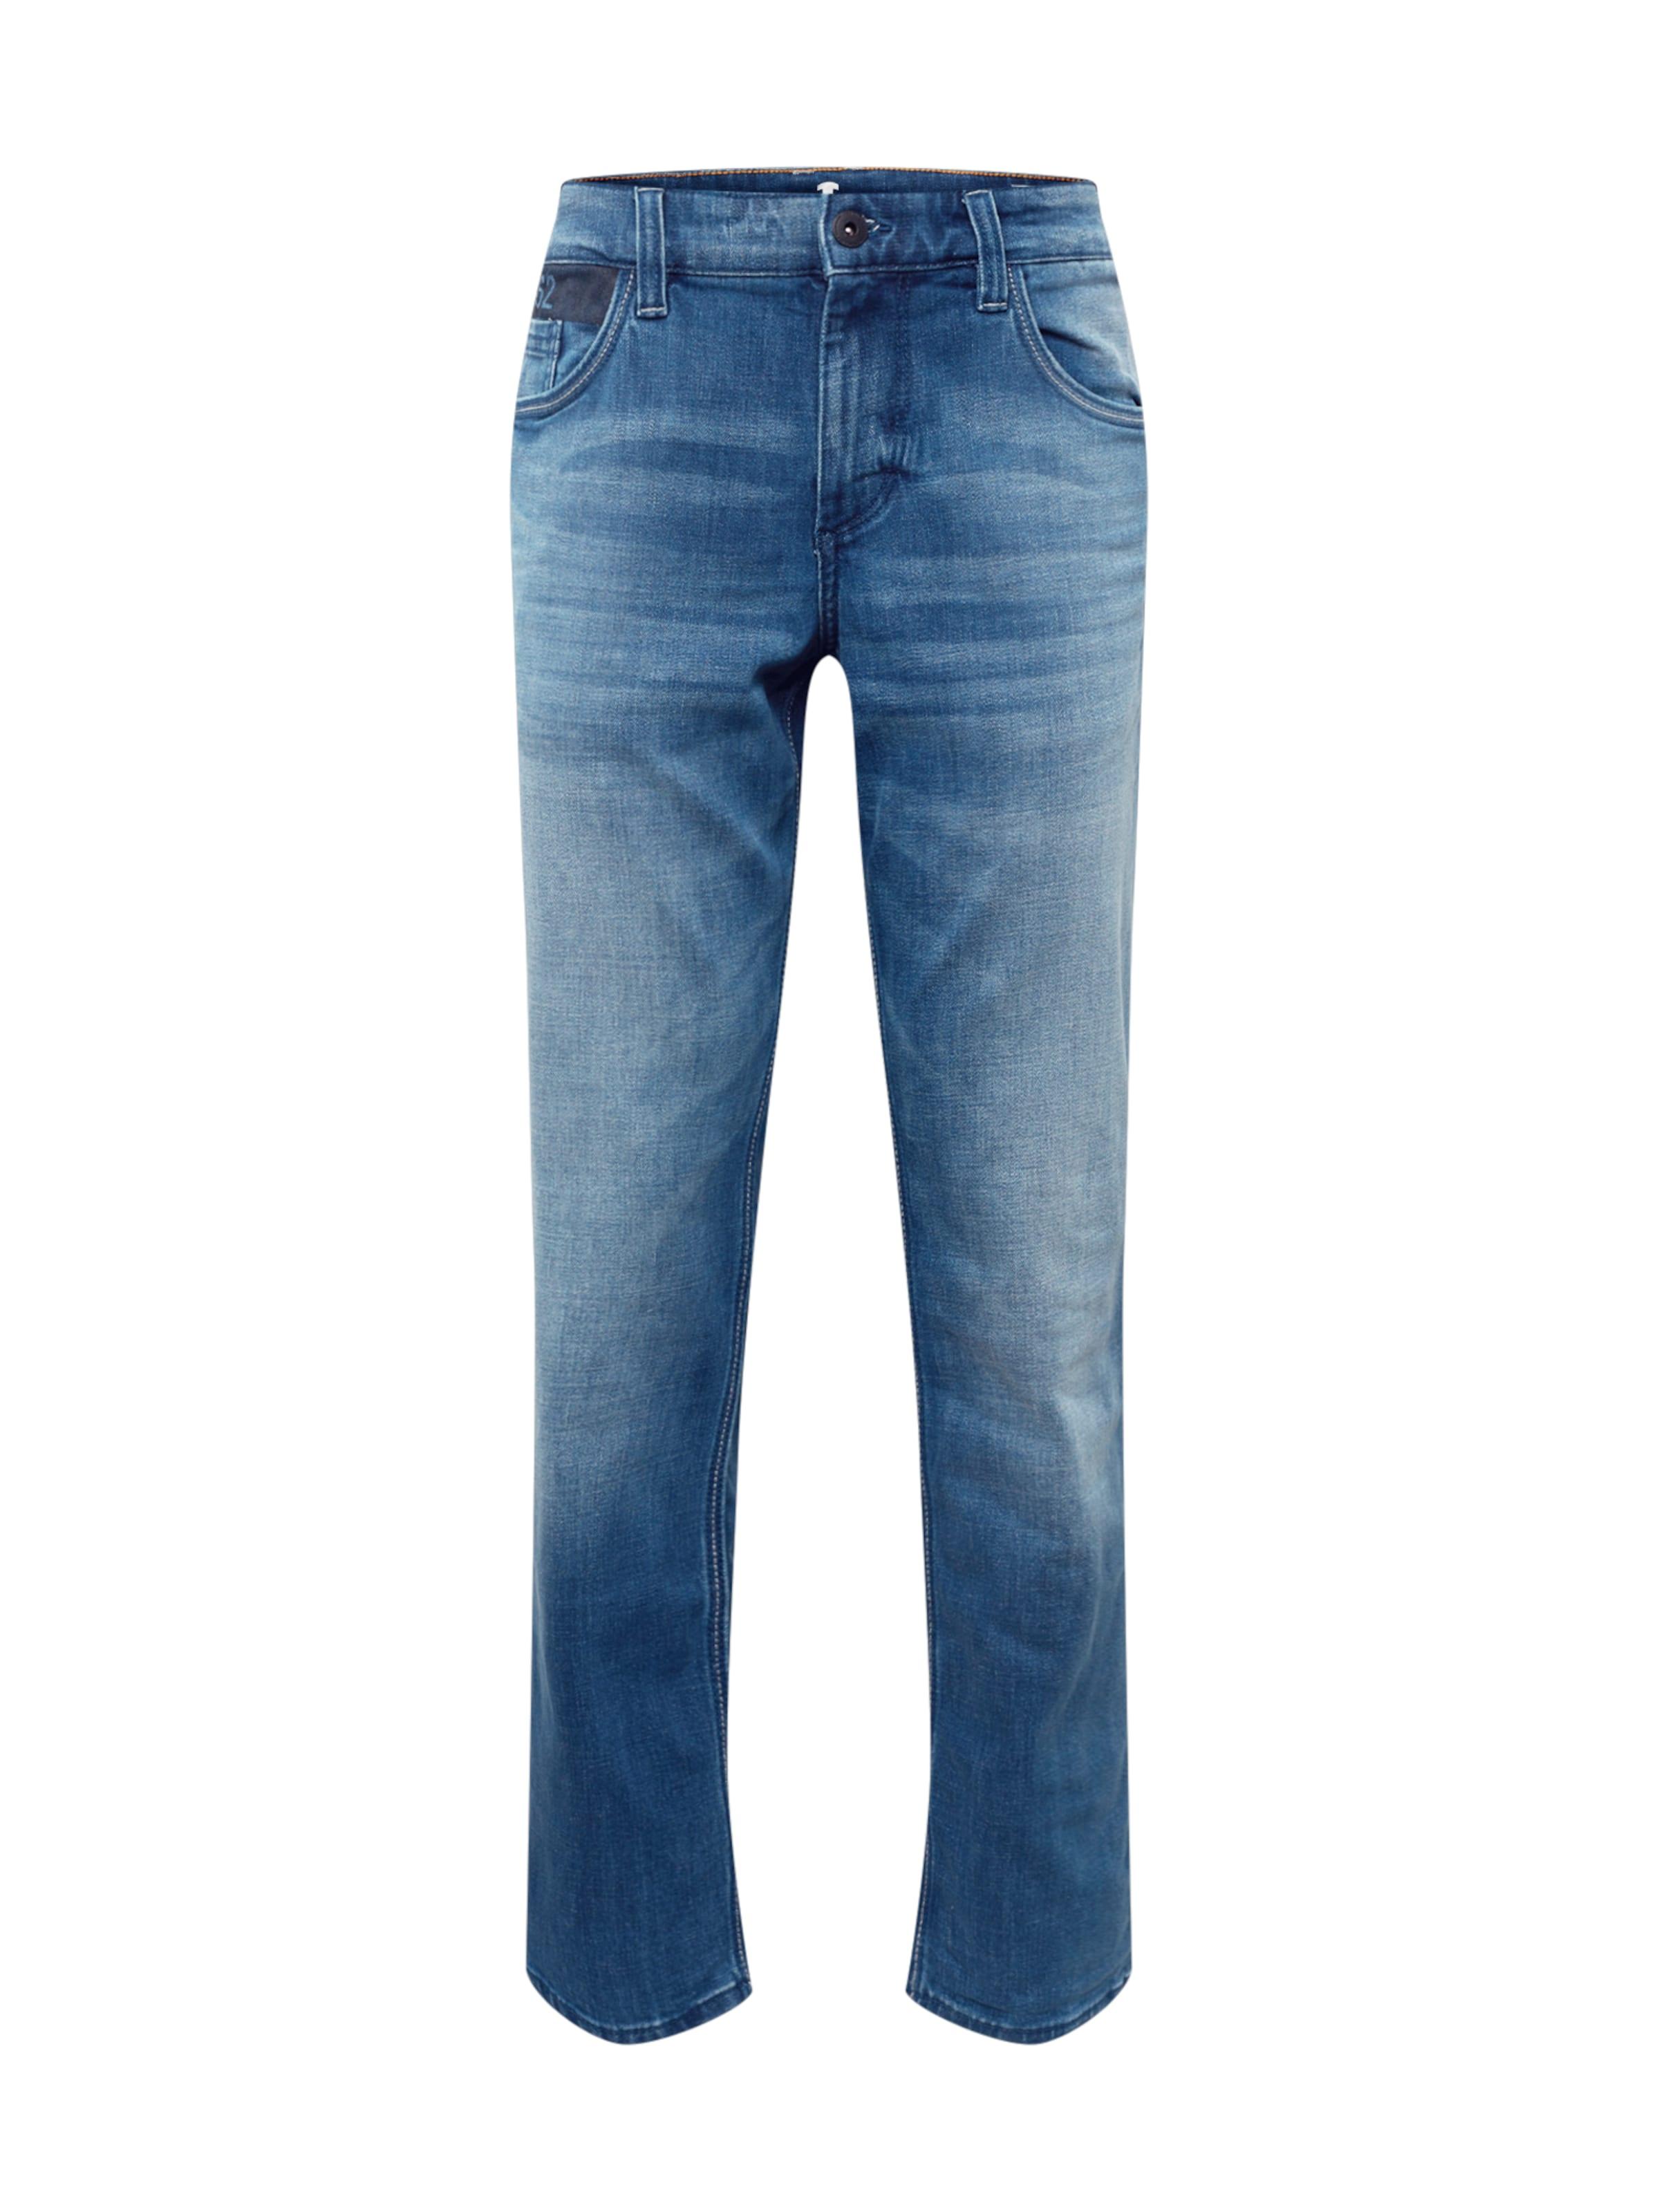 Jeans Denim 'marvin' Tom Tailor Blue In OPkXZiTu